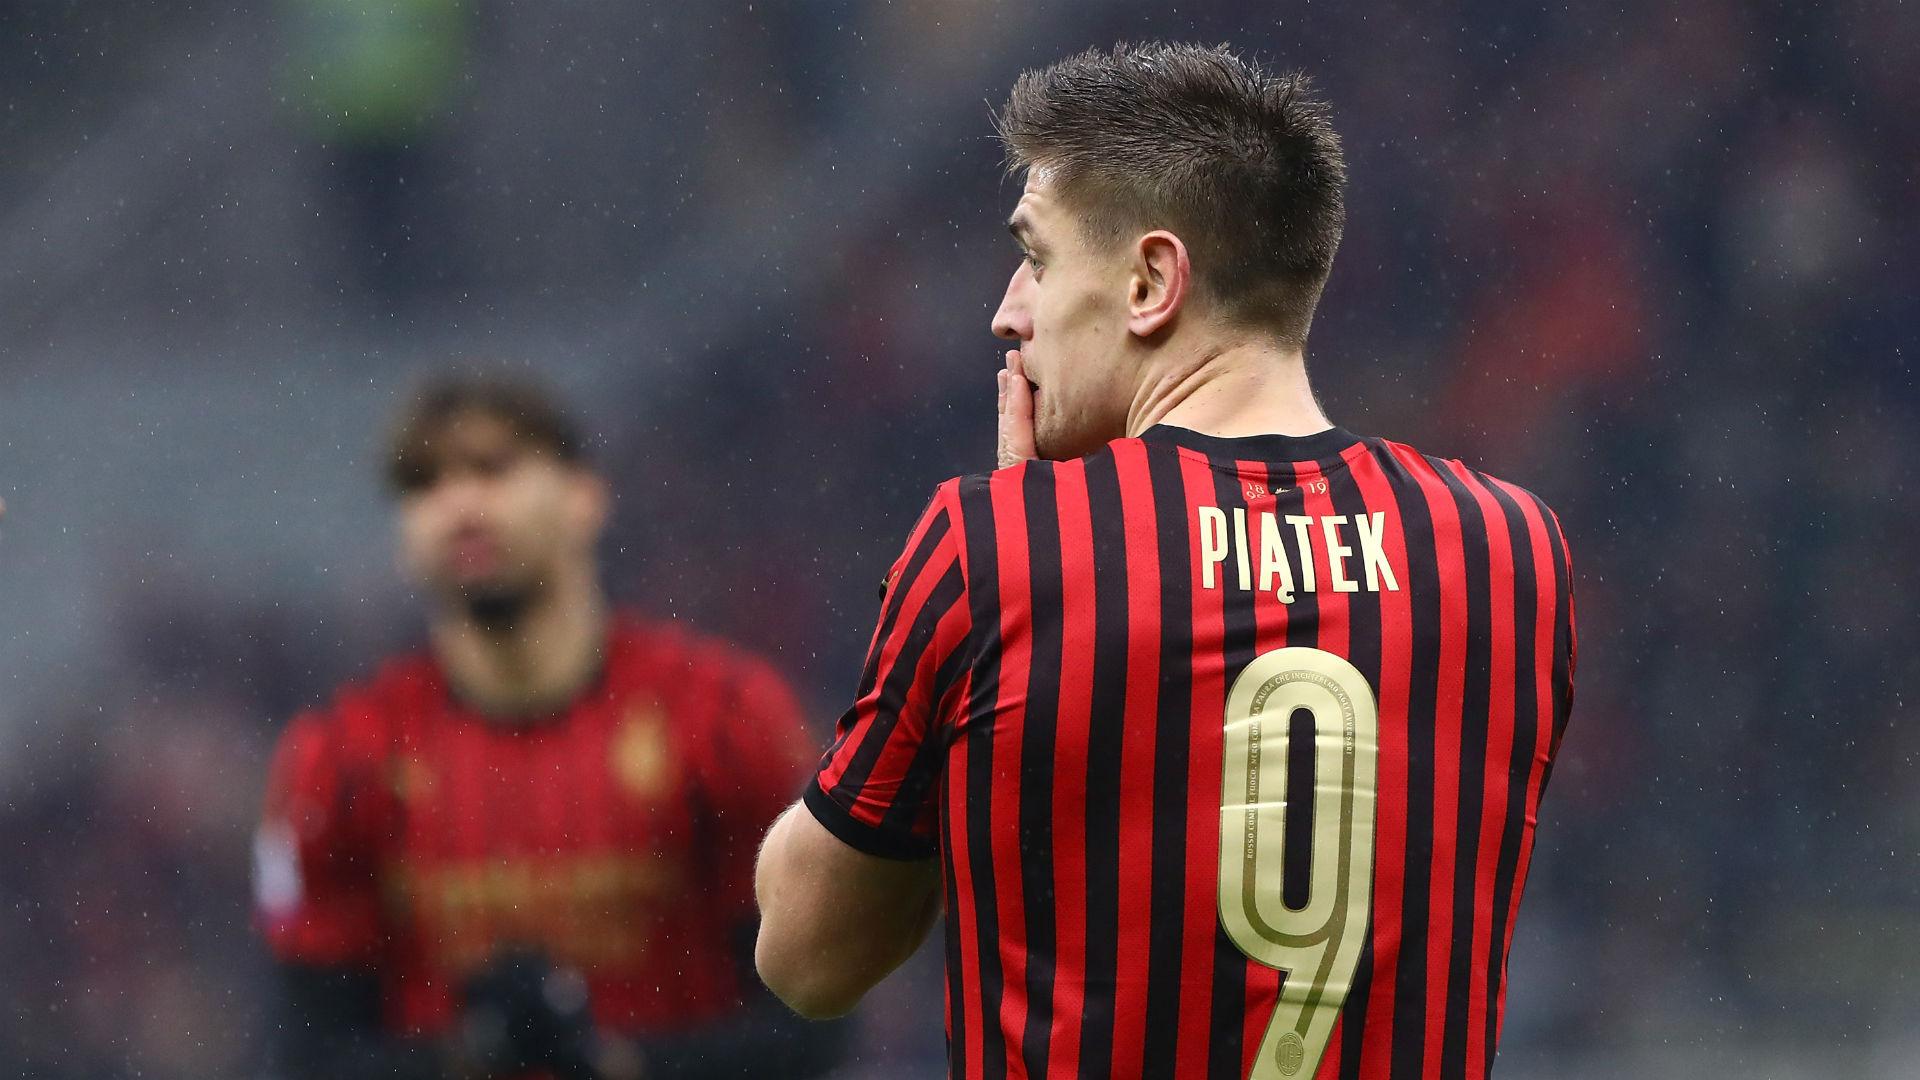 Milan need too many chances to score, says Pioli